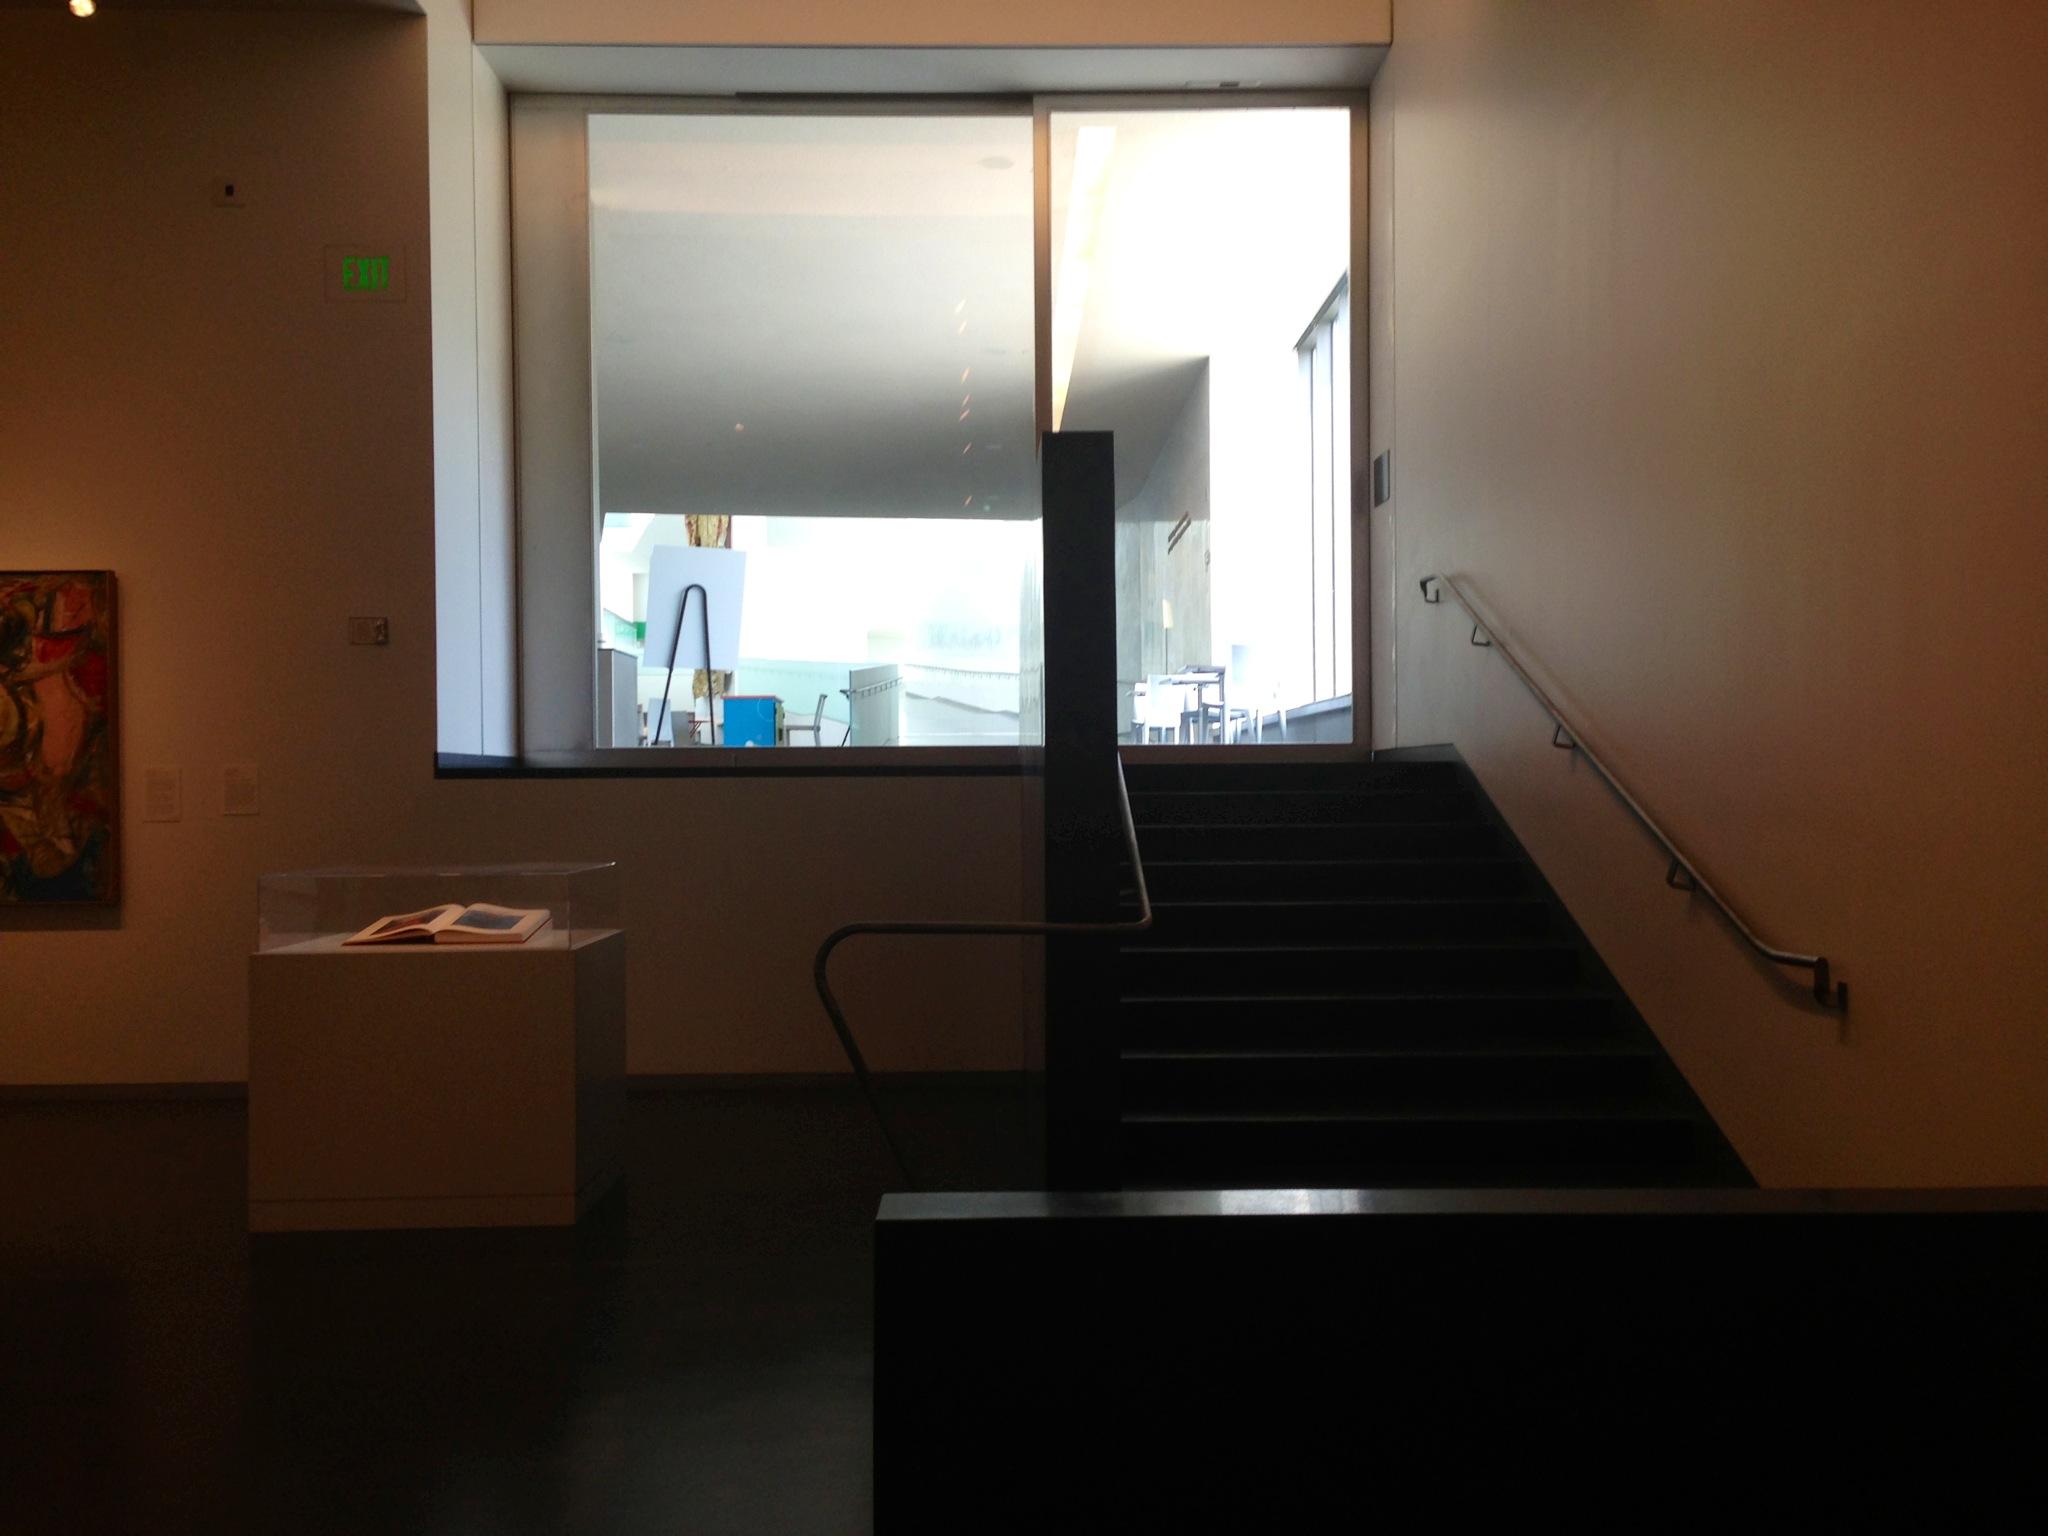 rchitecture for art's sake eliable Narratives - ^